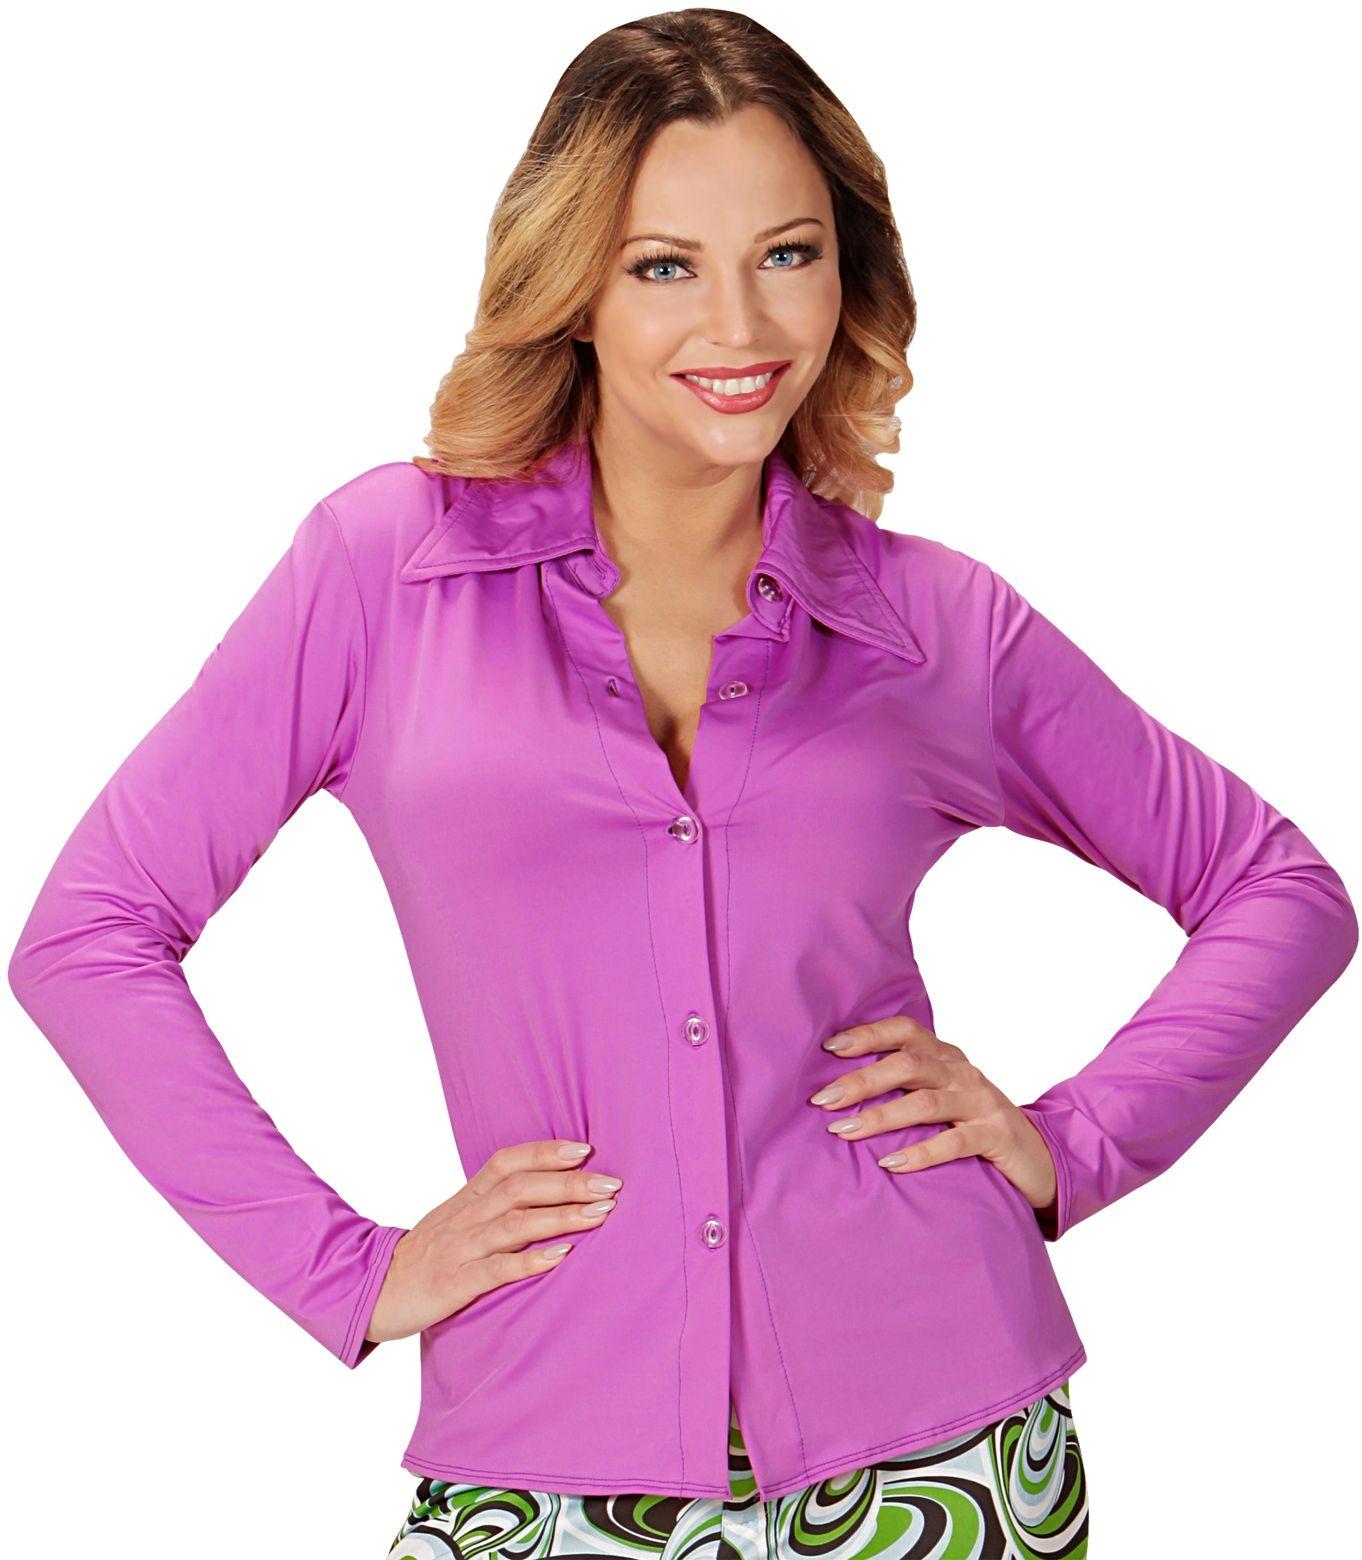 Jaren 70 blouse dames paars